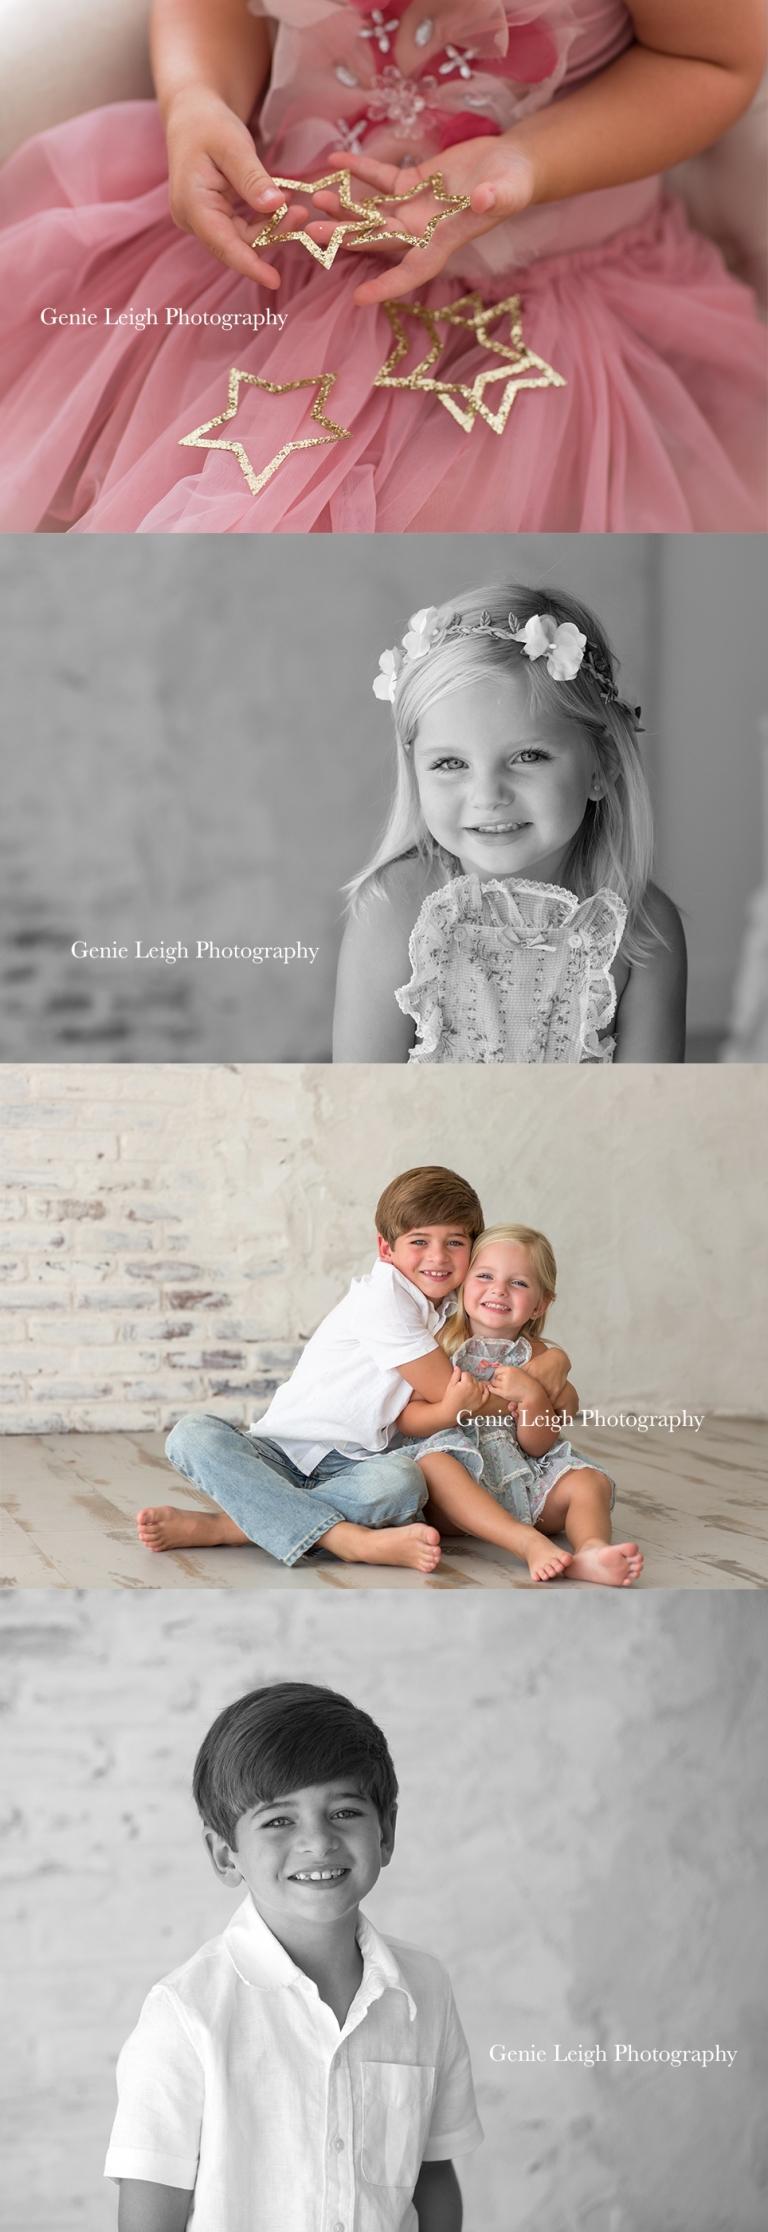 Genie Leigh Photography, Shoot for the stars, Studio, Child, Family Portrait Photography, Tutudumondu